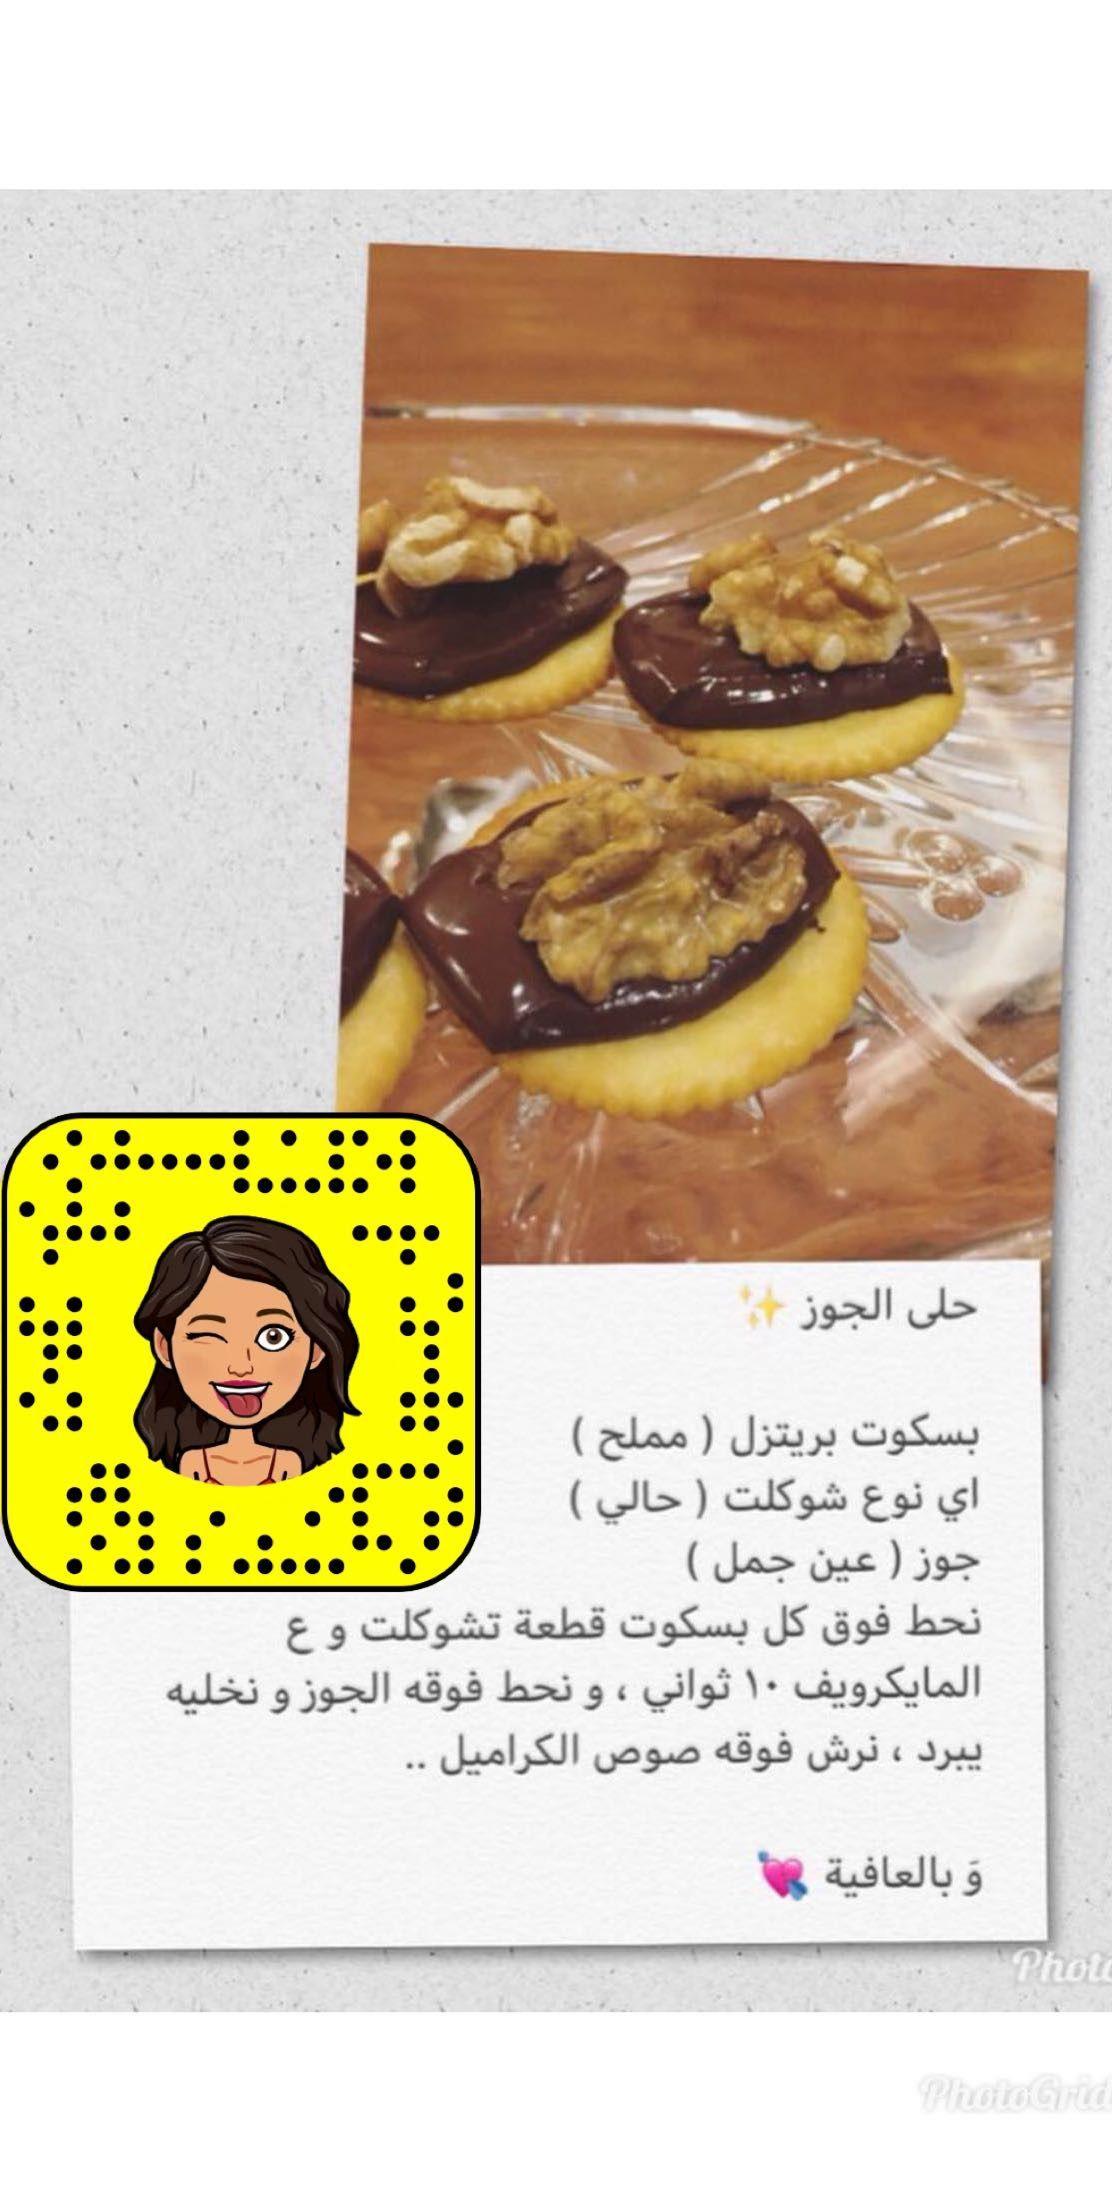 حلا الجوز In 2020 Food Breakfast Pancakes